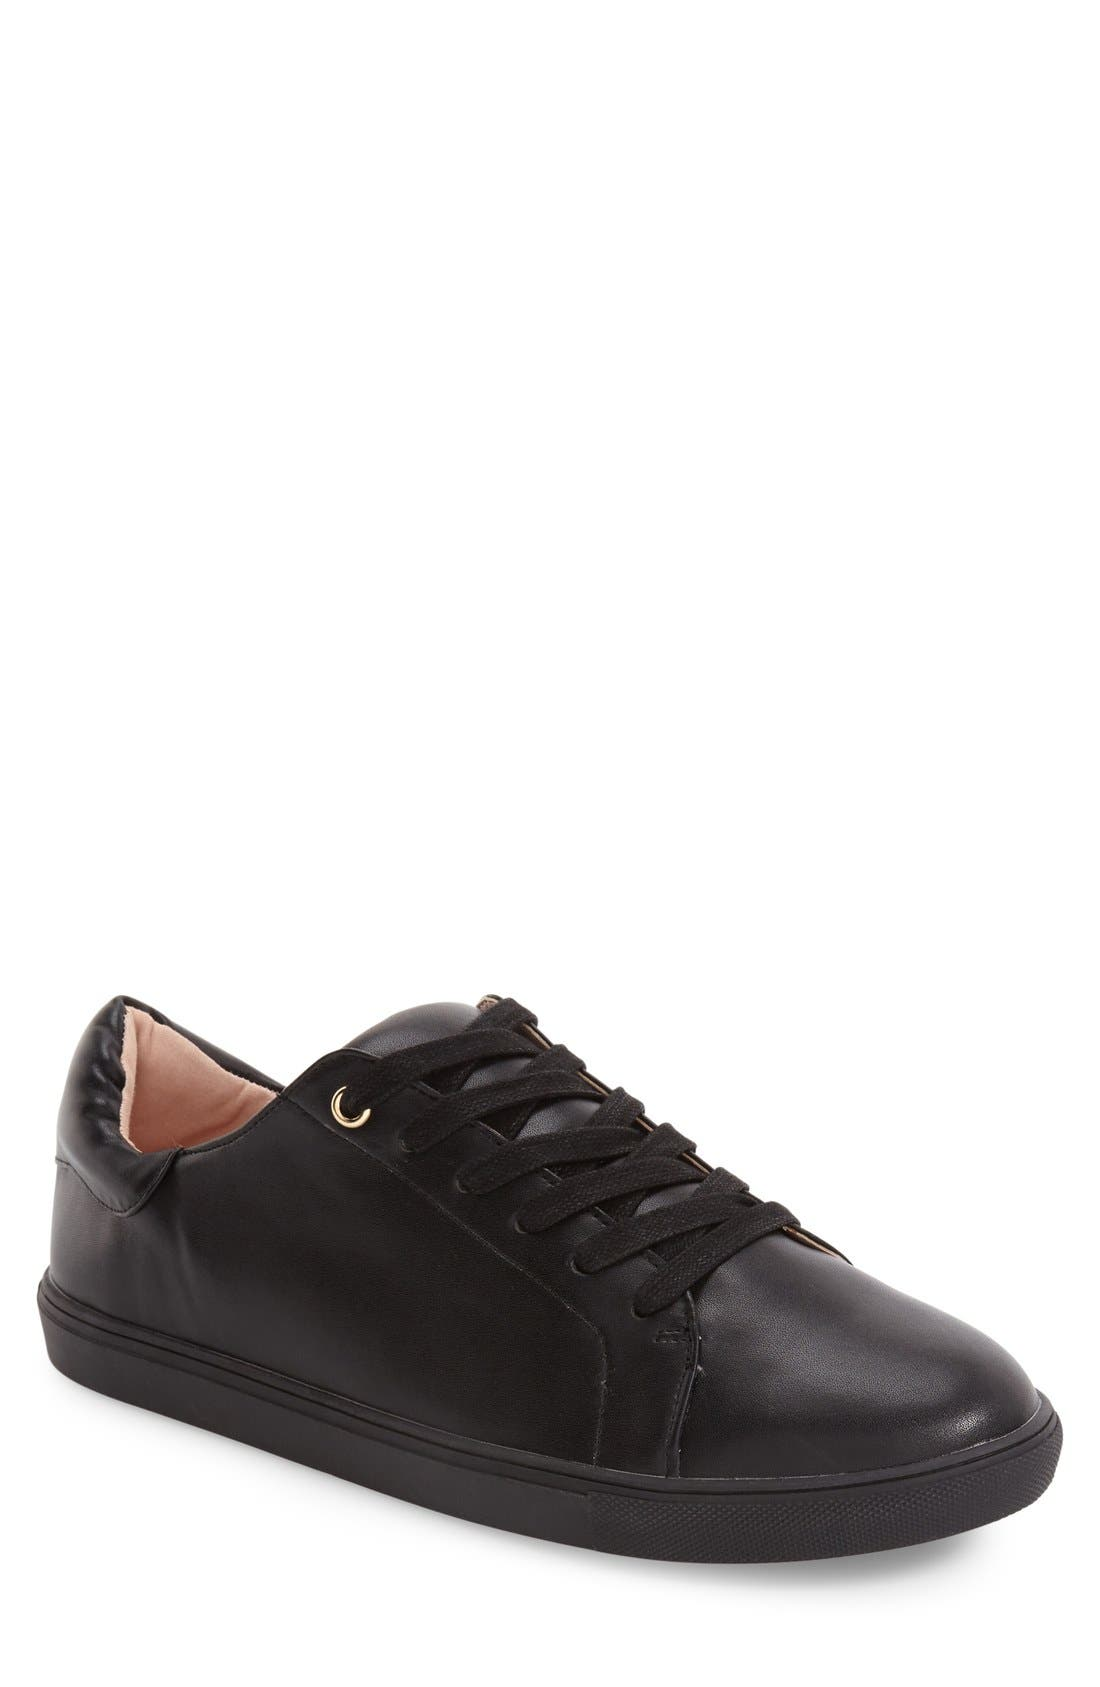 Alternate Image 1 Selected - Topshop Catseye Sneaker (Women)